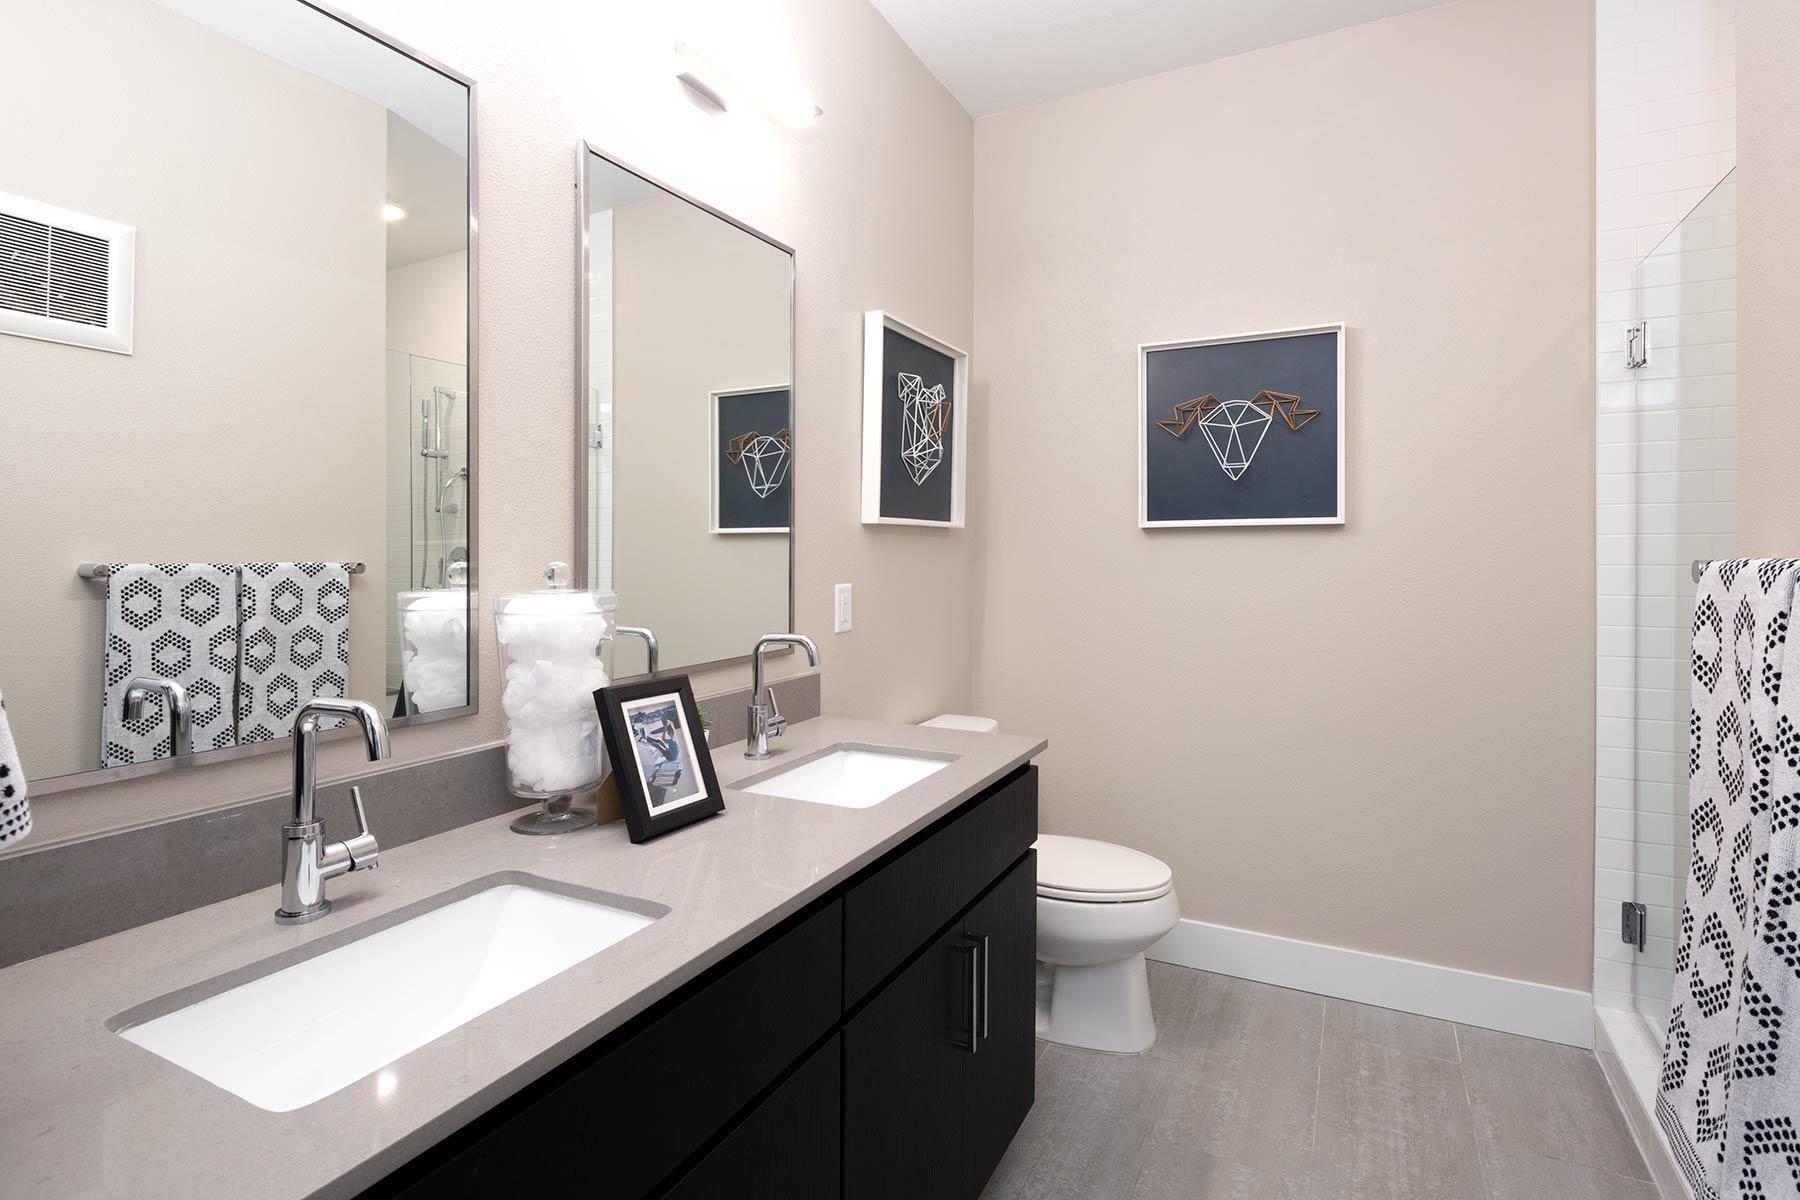 09-Luxurious Bathrooms with Quartz Countertops, Porcelain Tile Floors.jpg